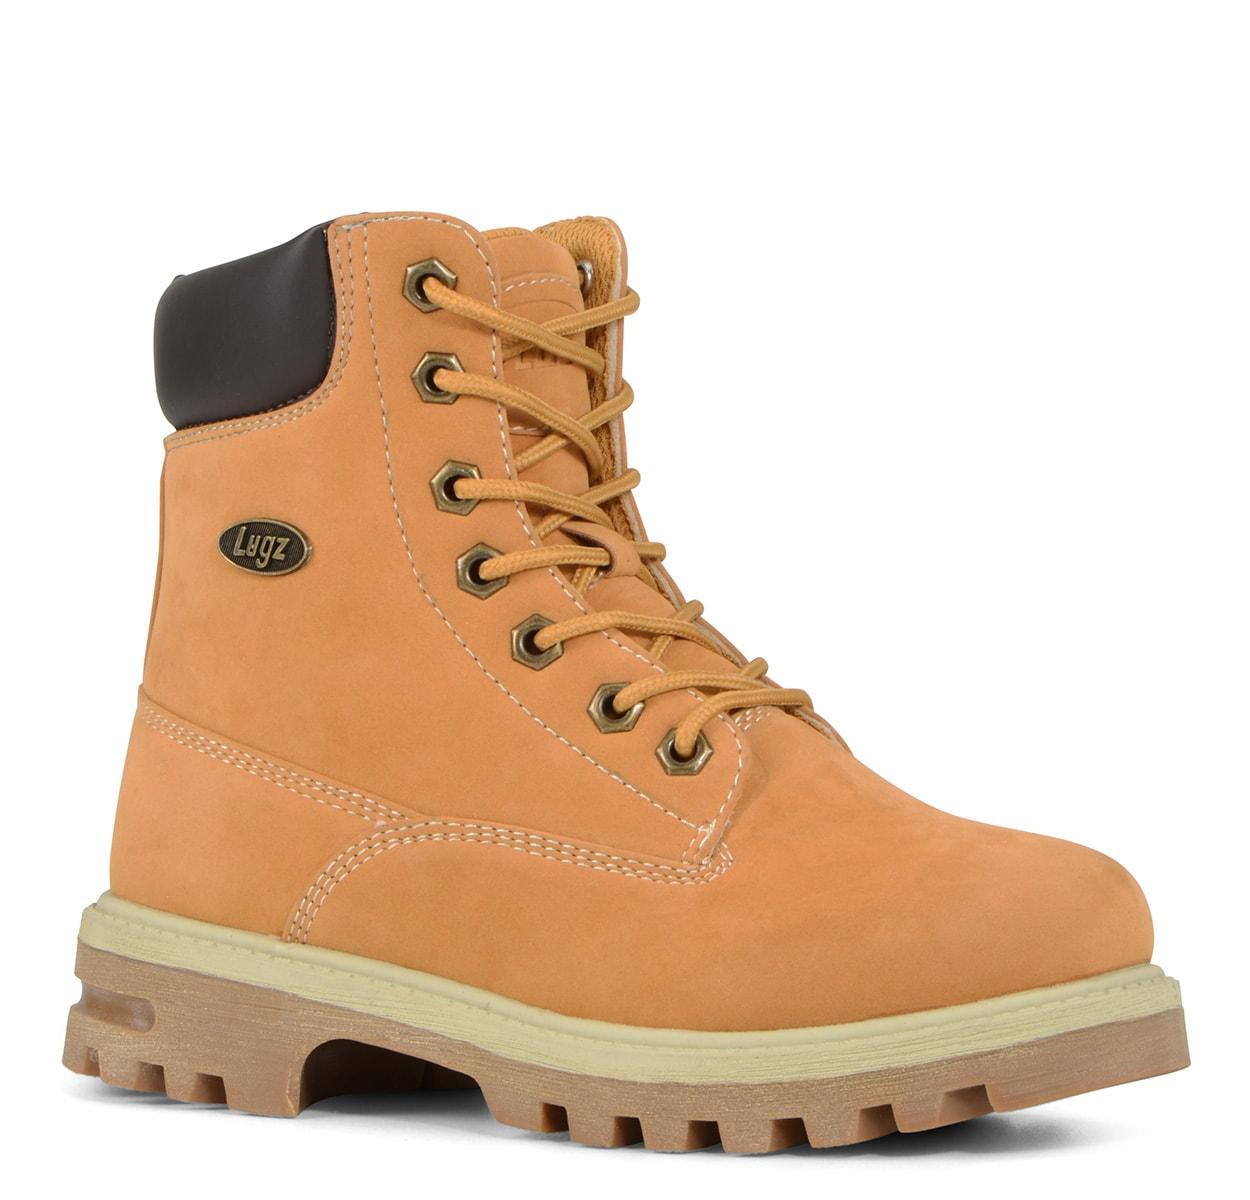 Gradeschool Empire Hi Water Resistant 6-Inch Boot (Choose Your Color: GOLDEN WHEAT/BARK/CREAM, Choose Your Size: 5.0)